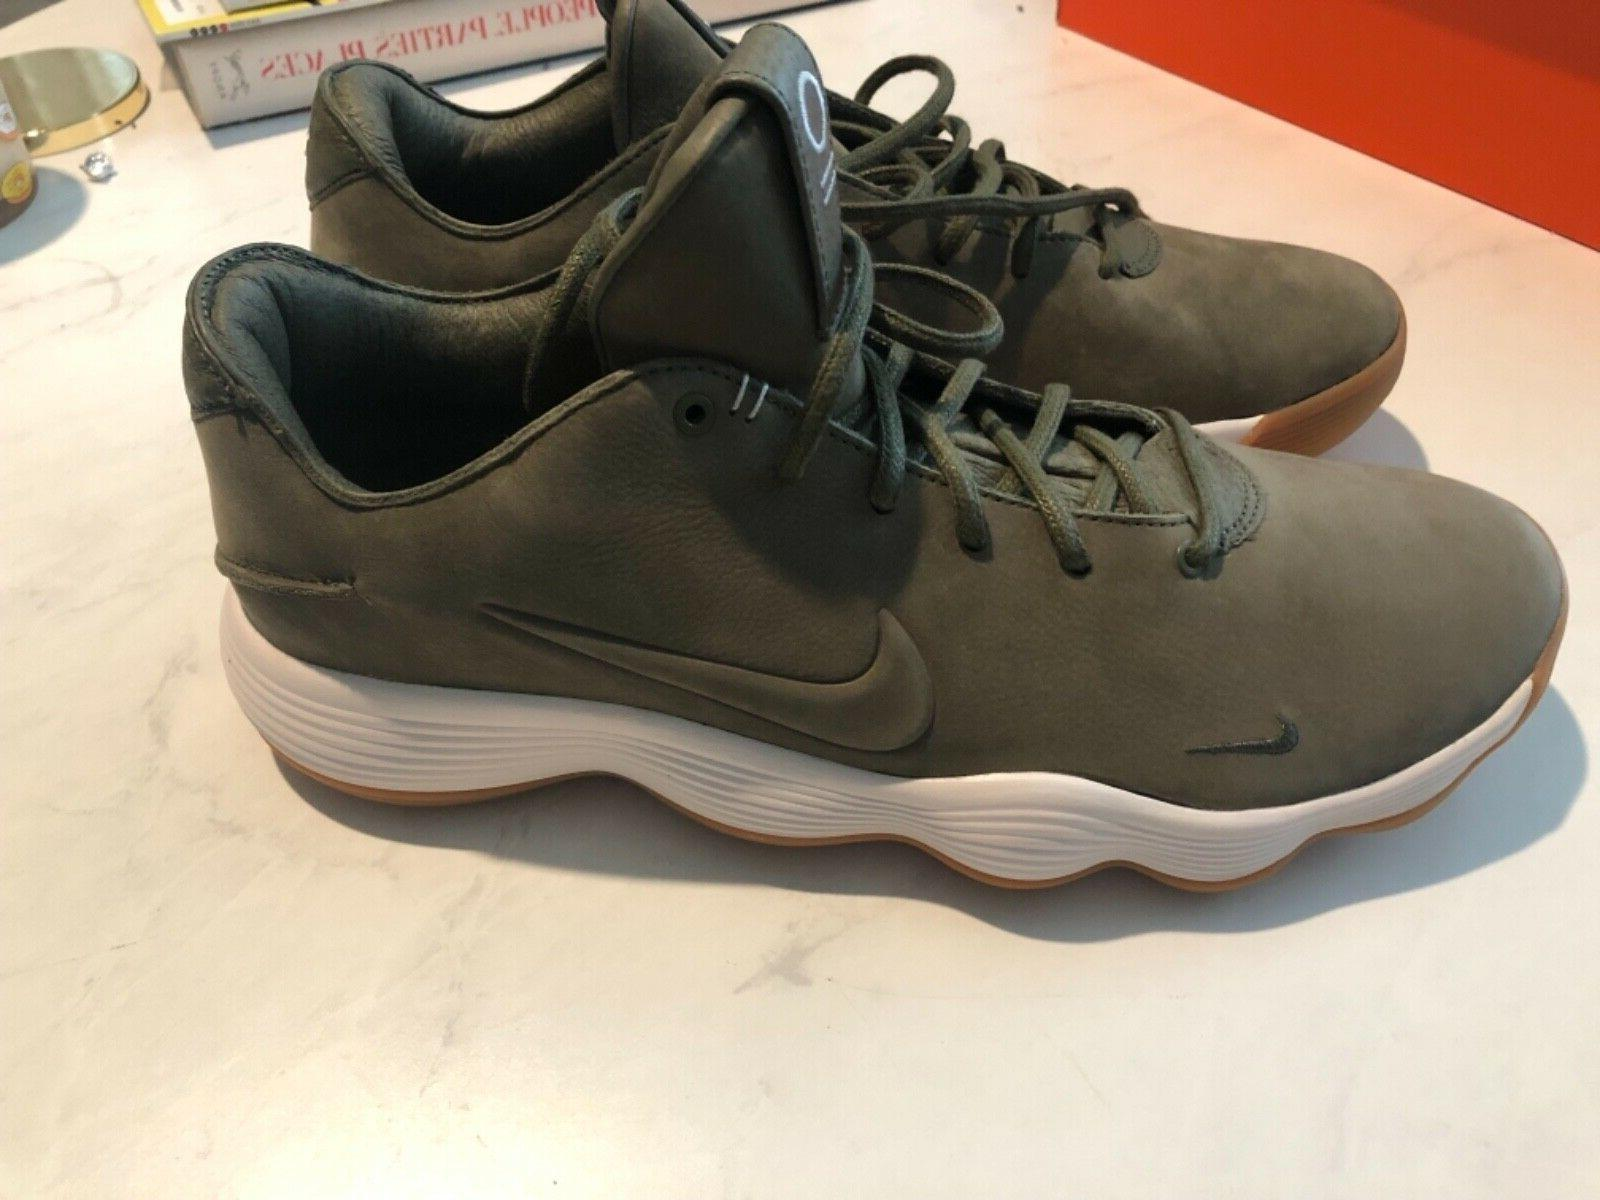 Mens Nike Hyperdunk Shoes Size 8.5, 11,